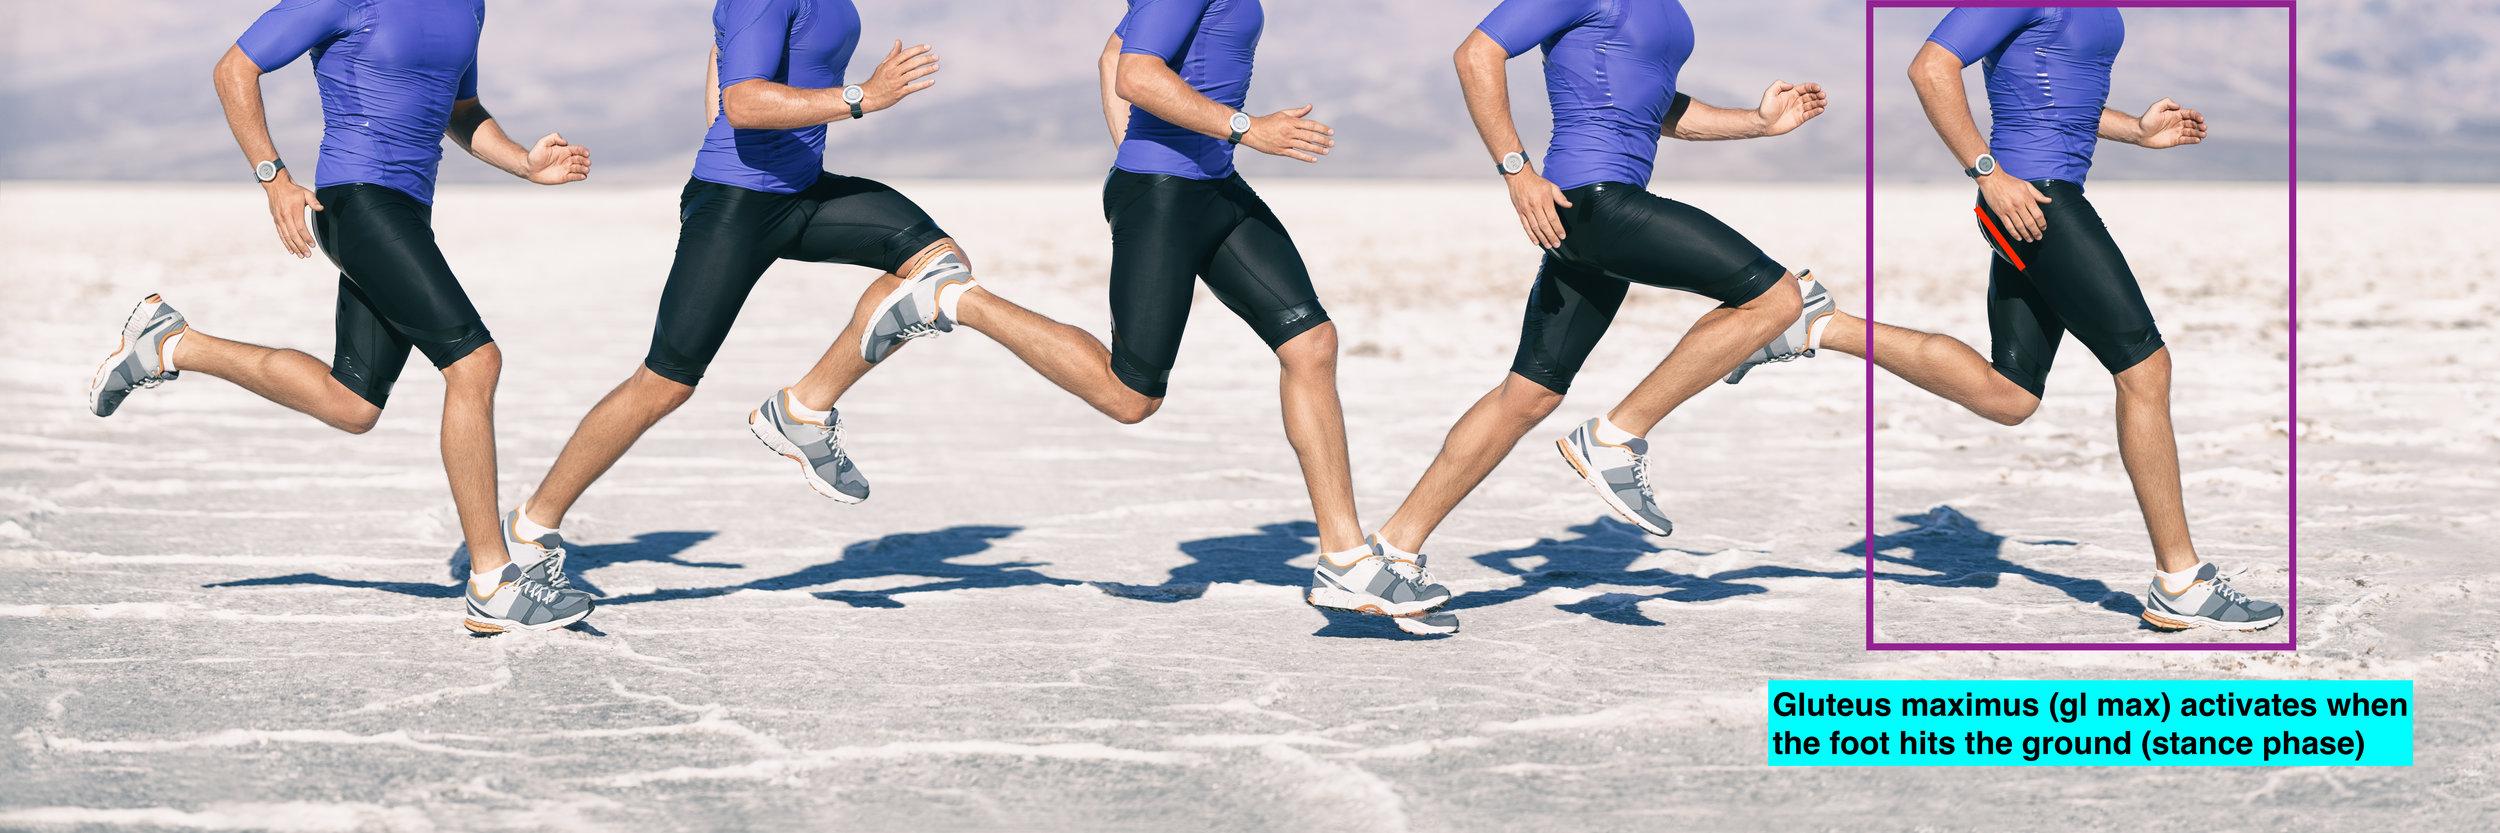 Running gait biomechanics glute maxjpeg.jpeg